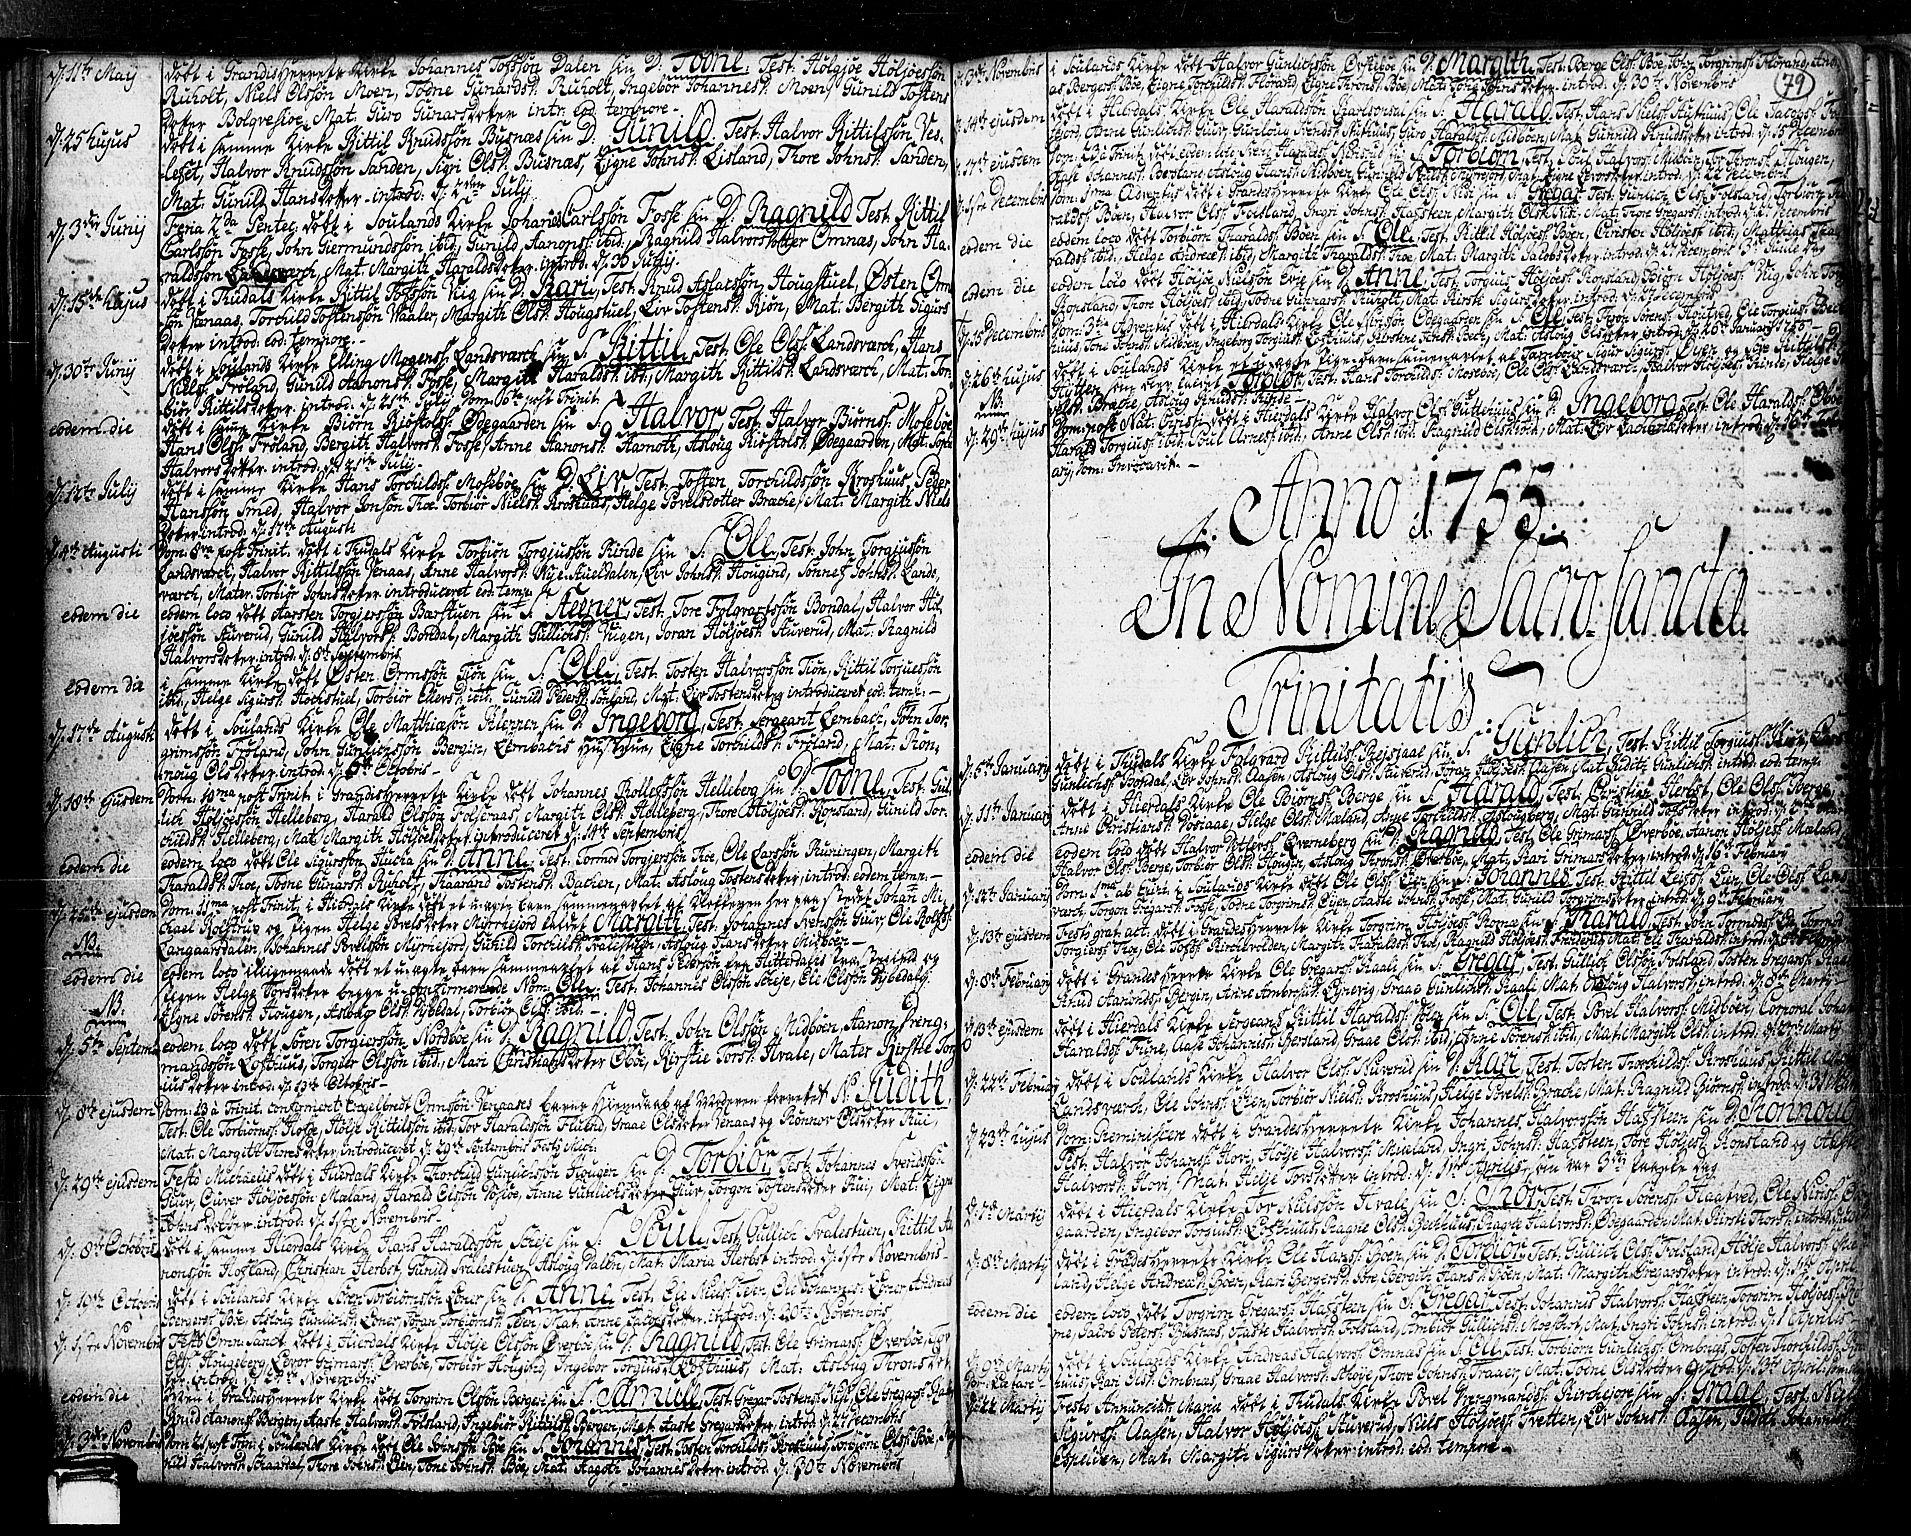 SAKO, Hjartdal kirkebøker, F/Fa/L0003: Ministerialbok nr. I 3, 1727-1775, s. 79